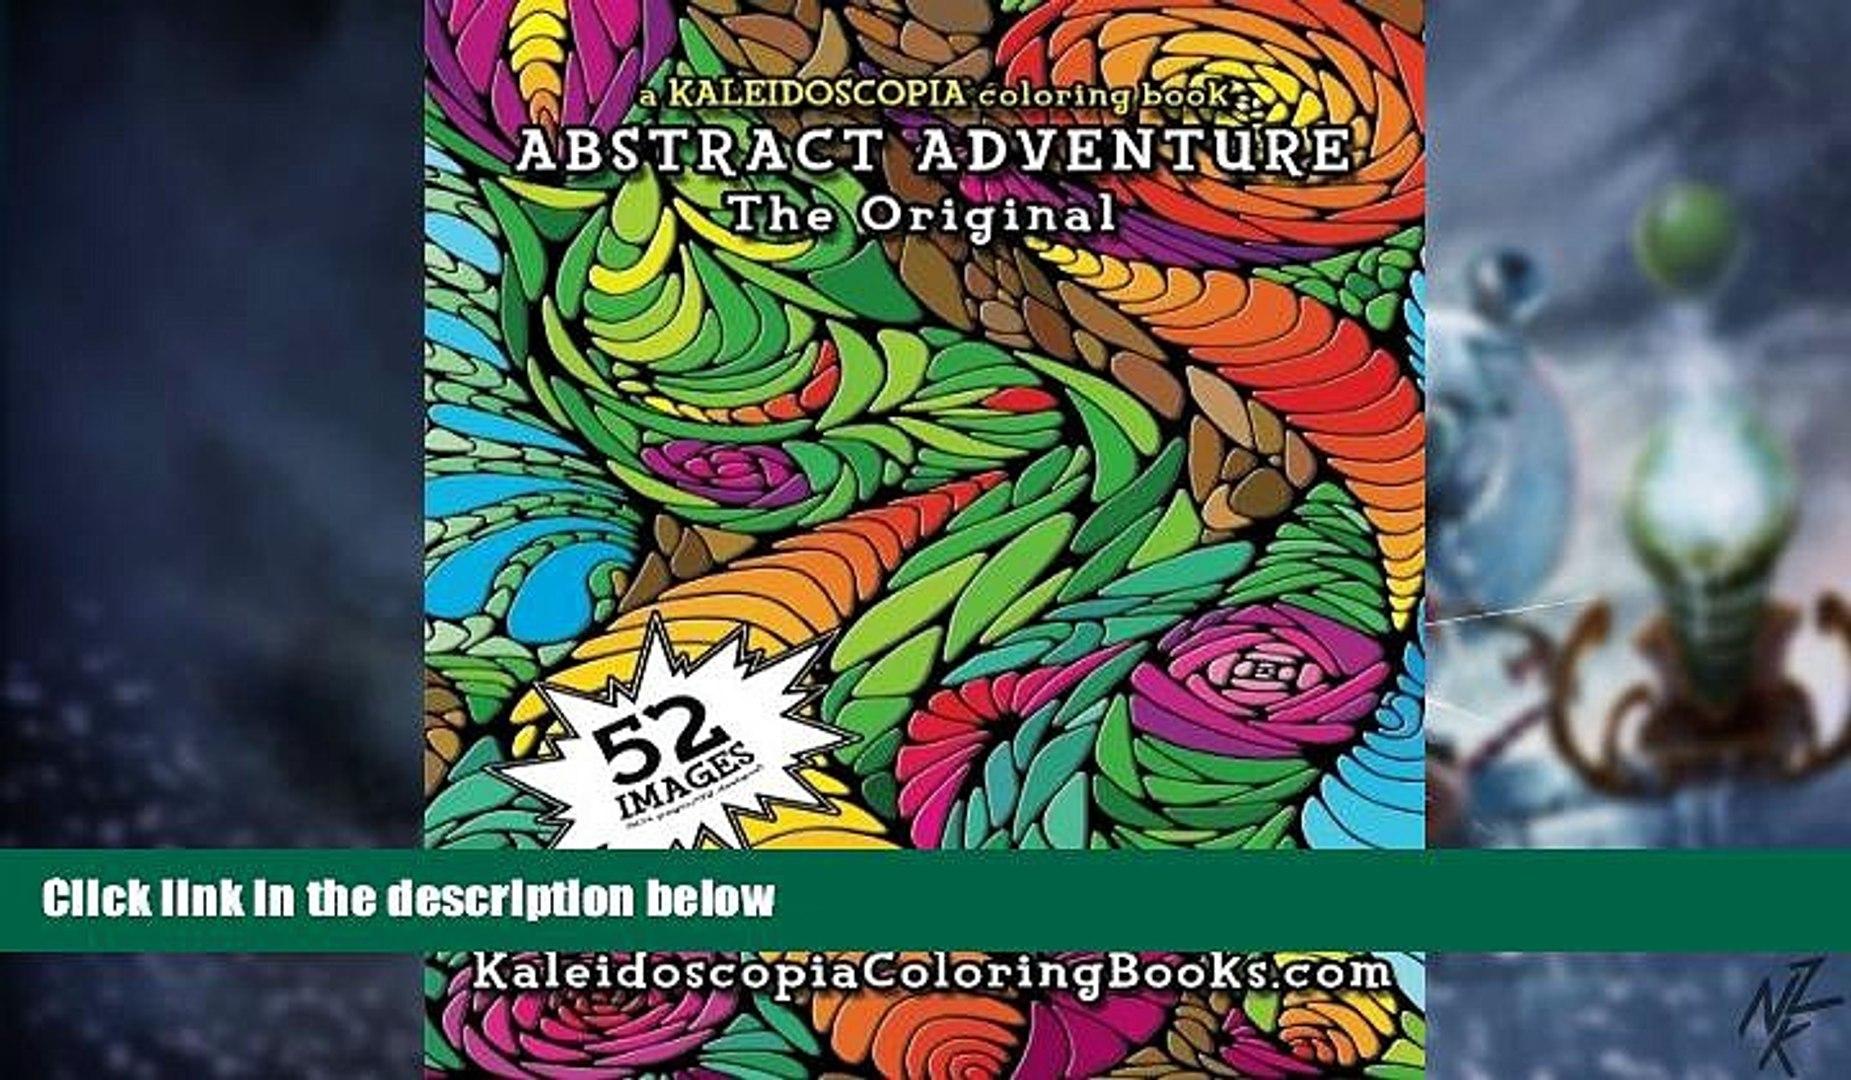 Big Deals Abstract Adventure: A Kaleidoscopia Coloring Book: The Original  Free Full Read Best